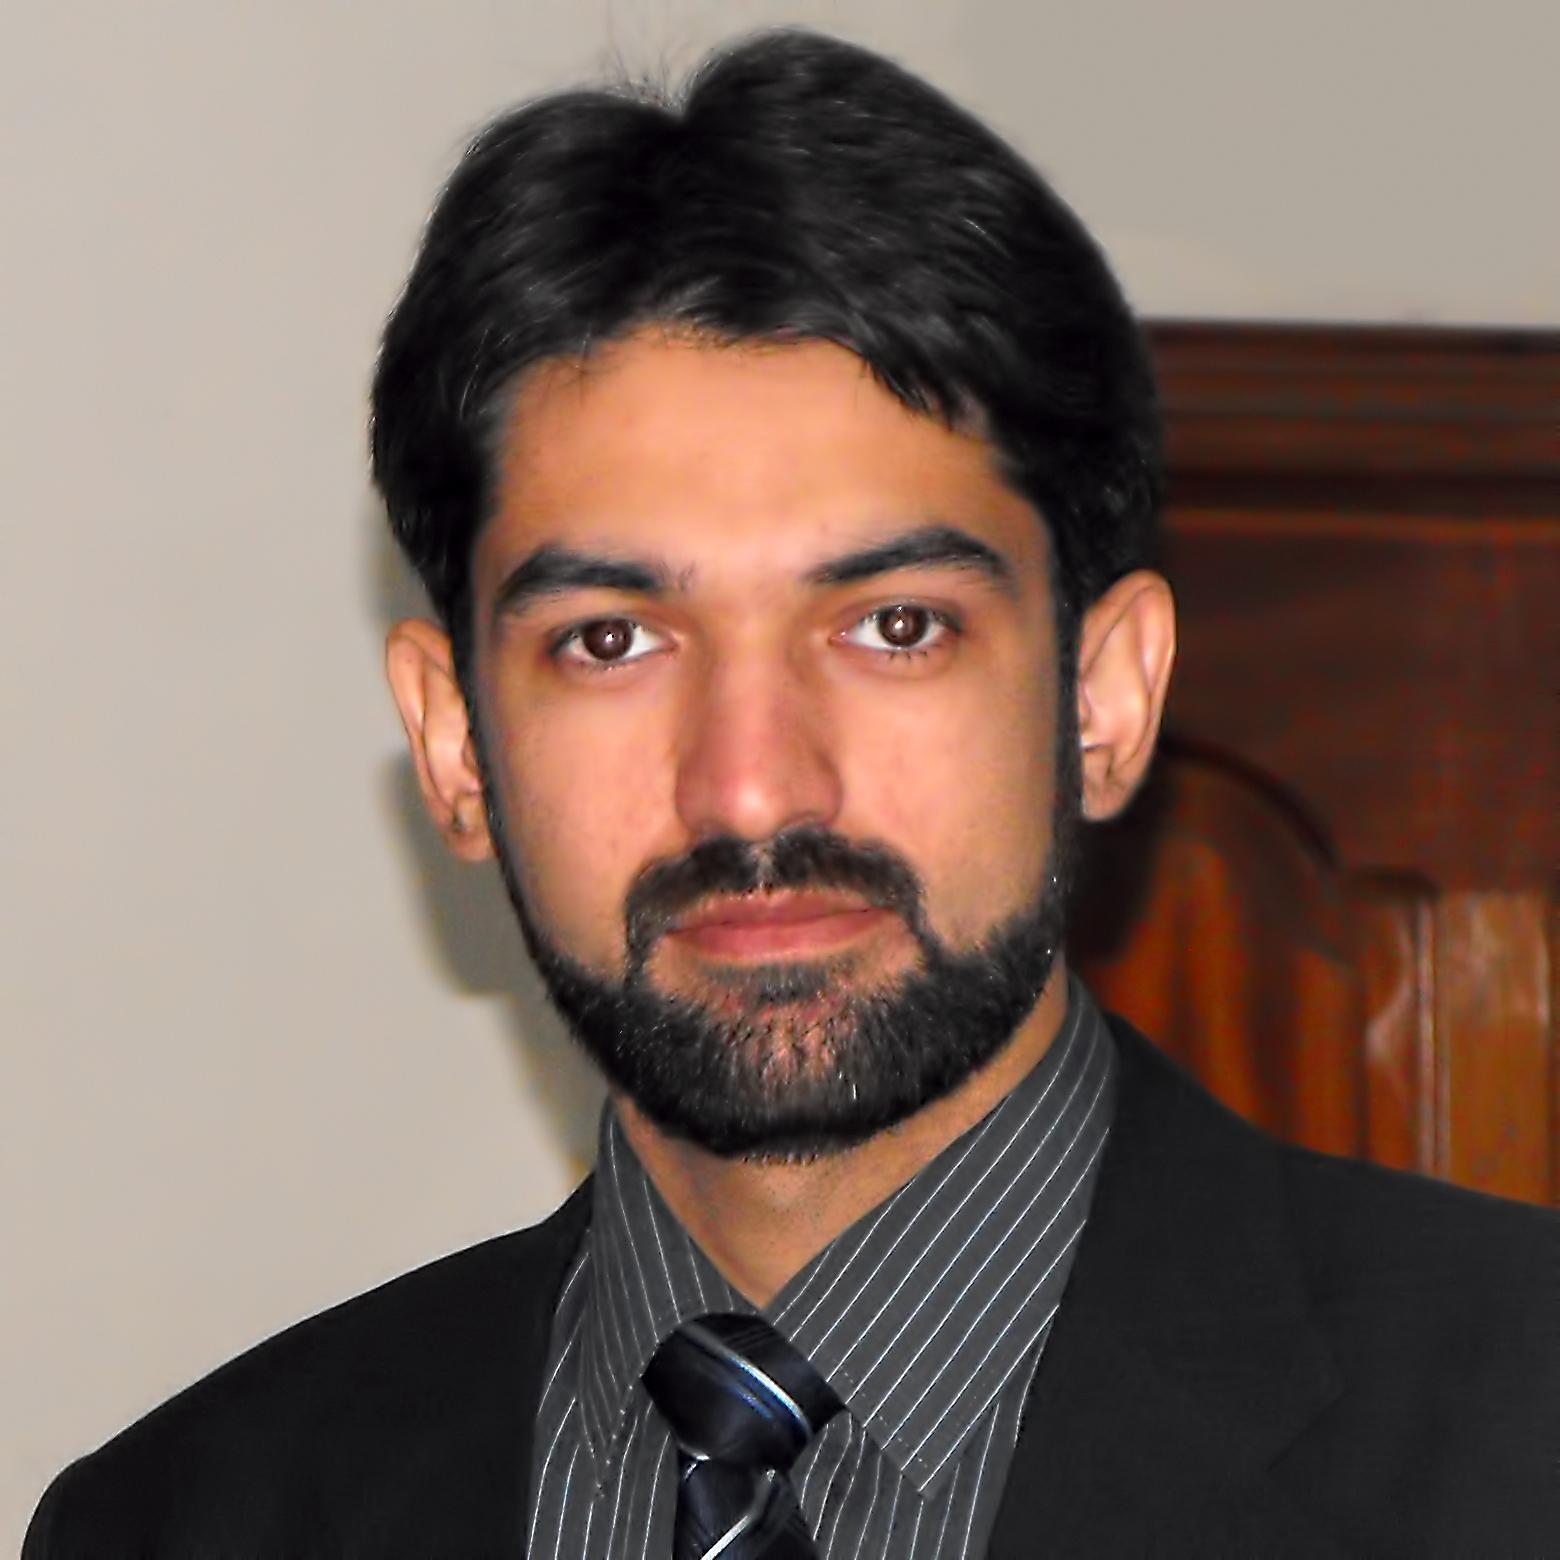 Akifullah Khan